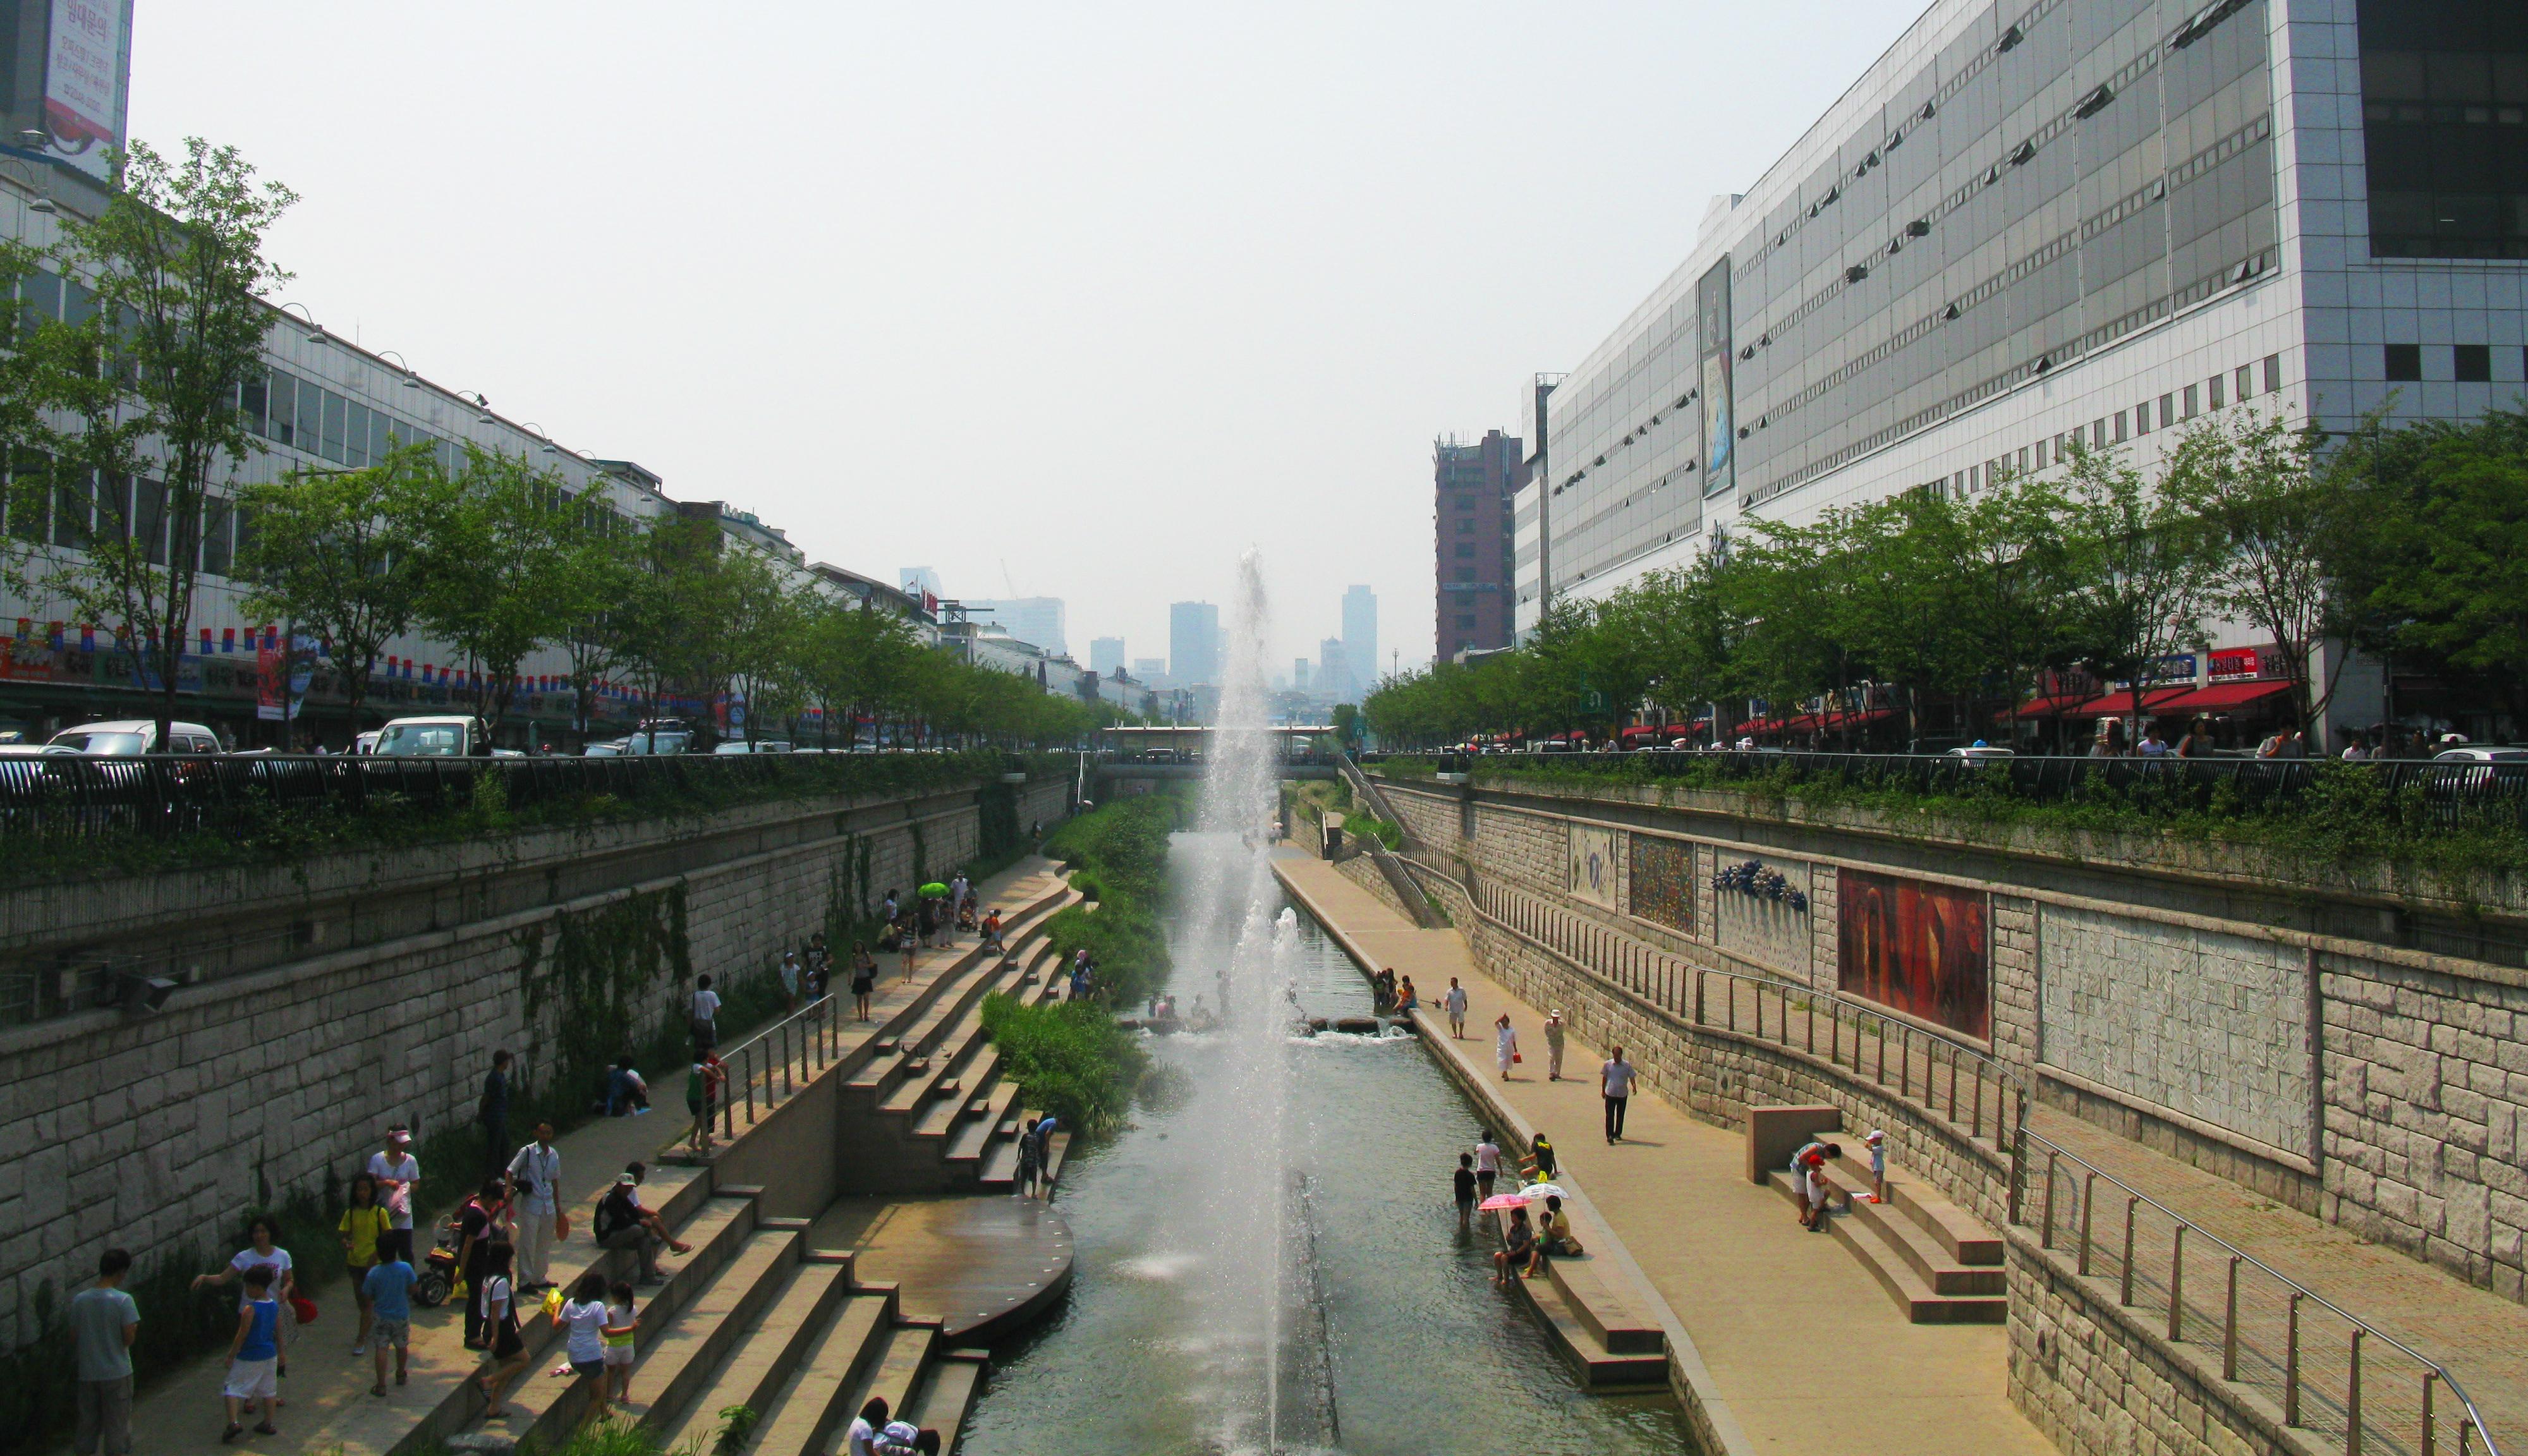 Voyage en Asie - Séoul